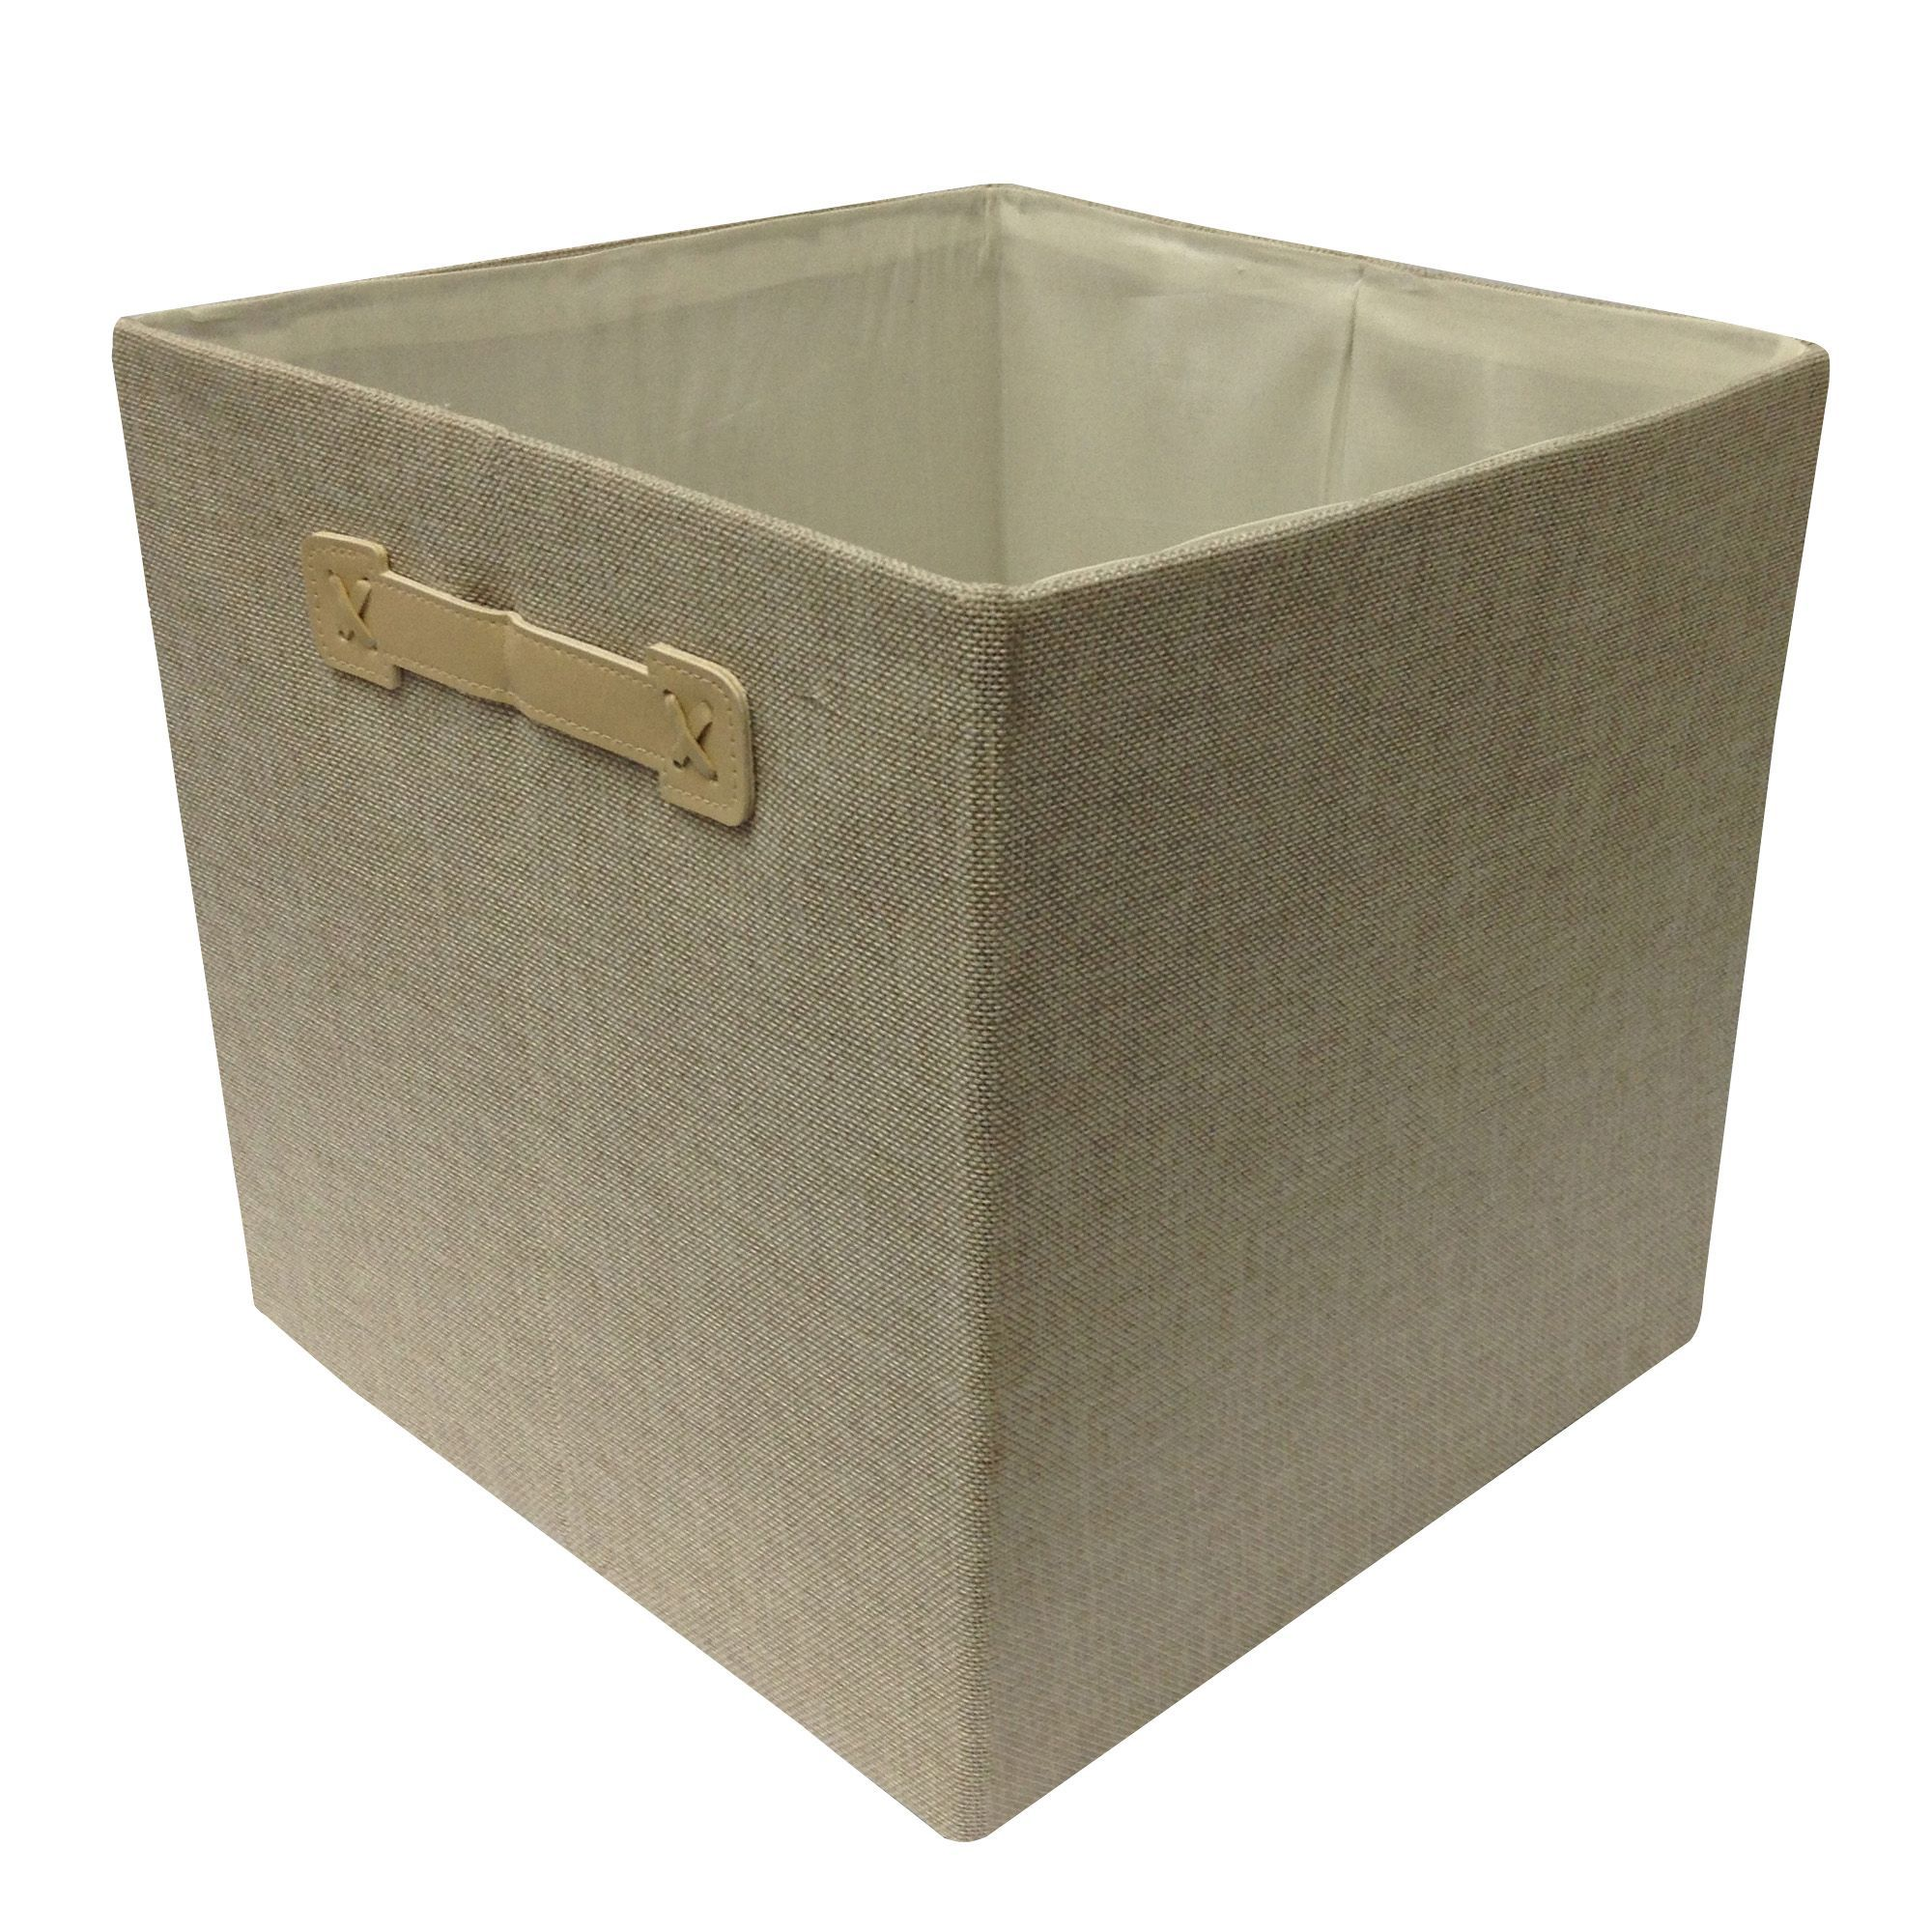 Bathroom Suites Homebase Form Beige Plastic Storage Box Departments Diy At Bq